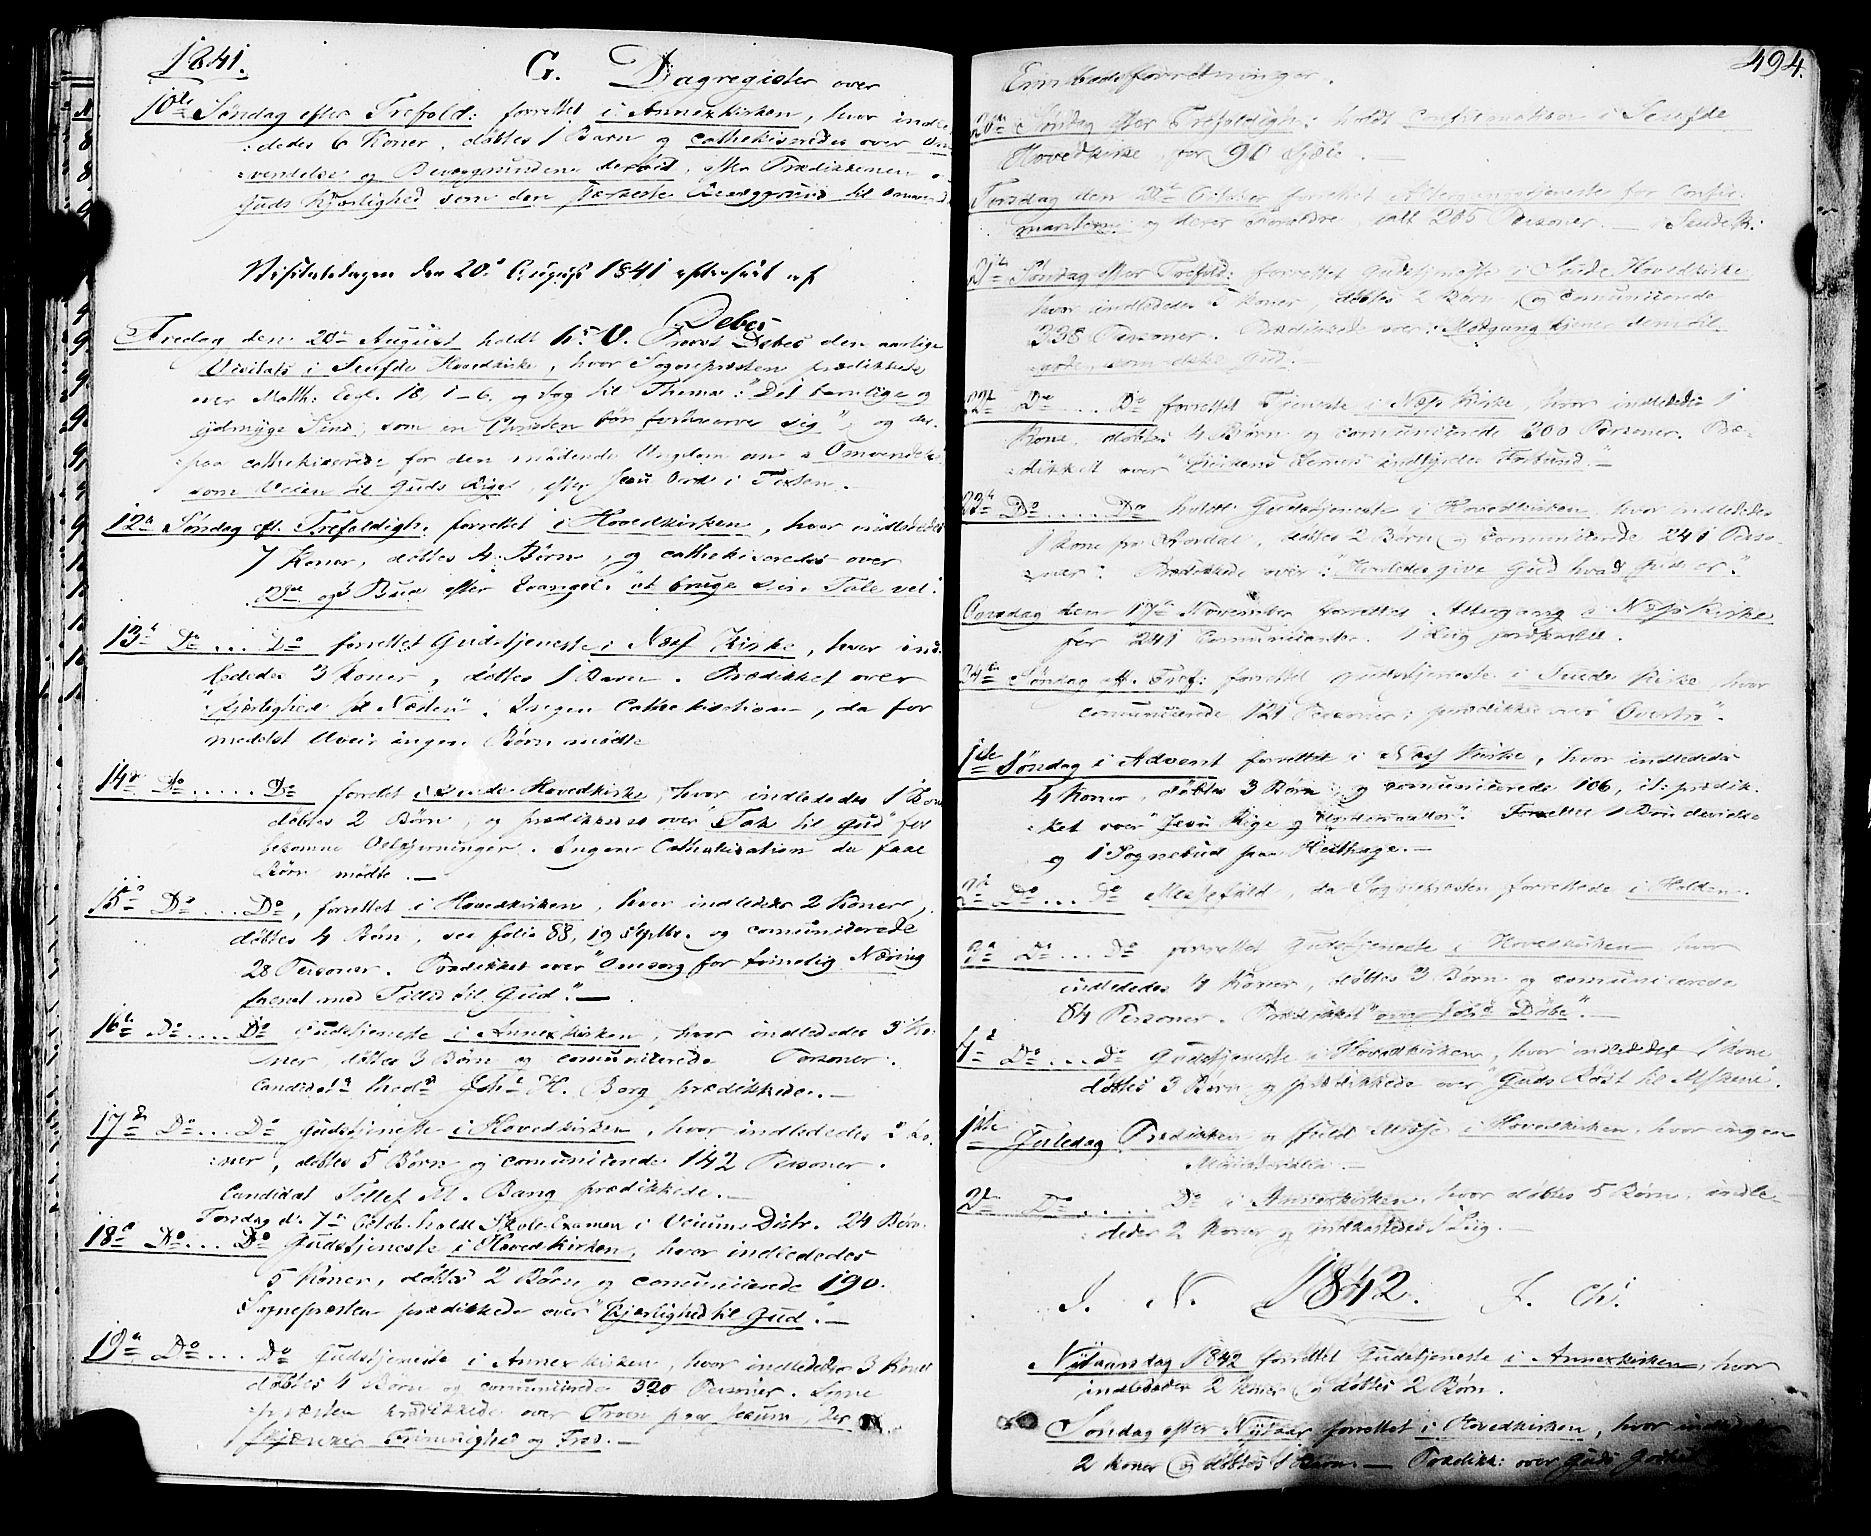 SAKO, Sauherad kirkebøker, F/Fa/L0006: Ministerialbok nr. I 6, 1827-1850, s. 494